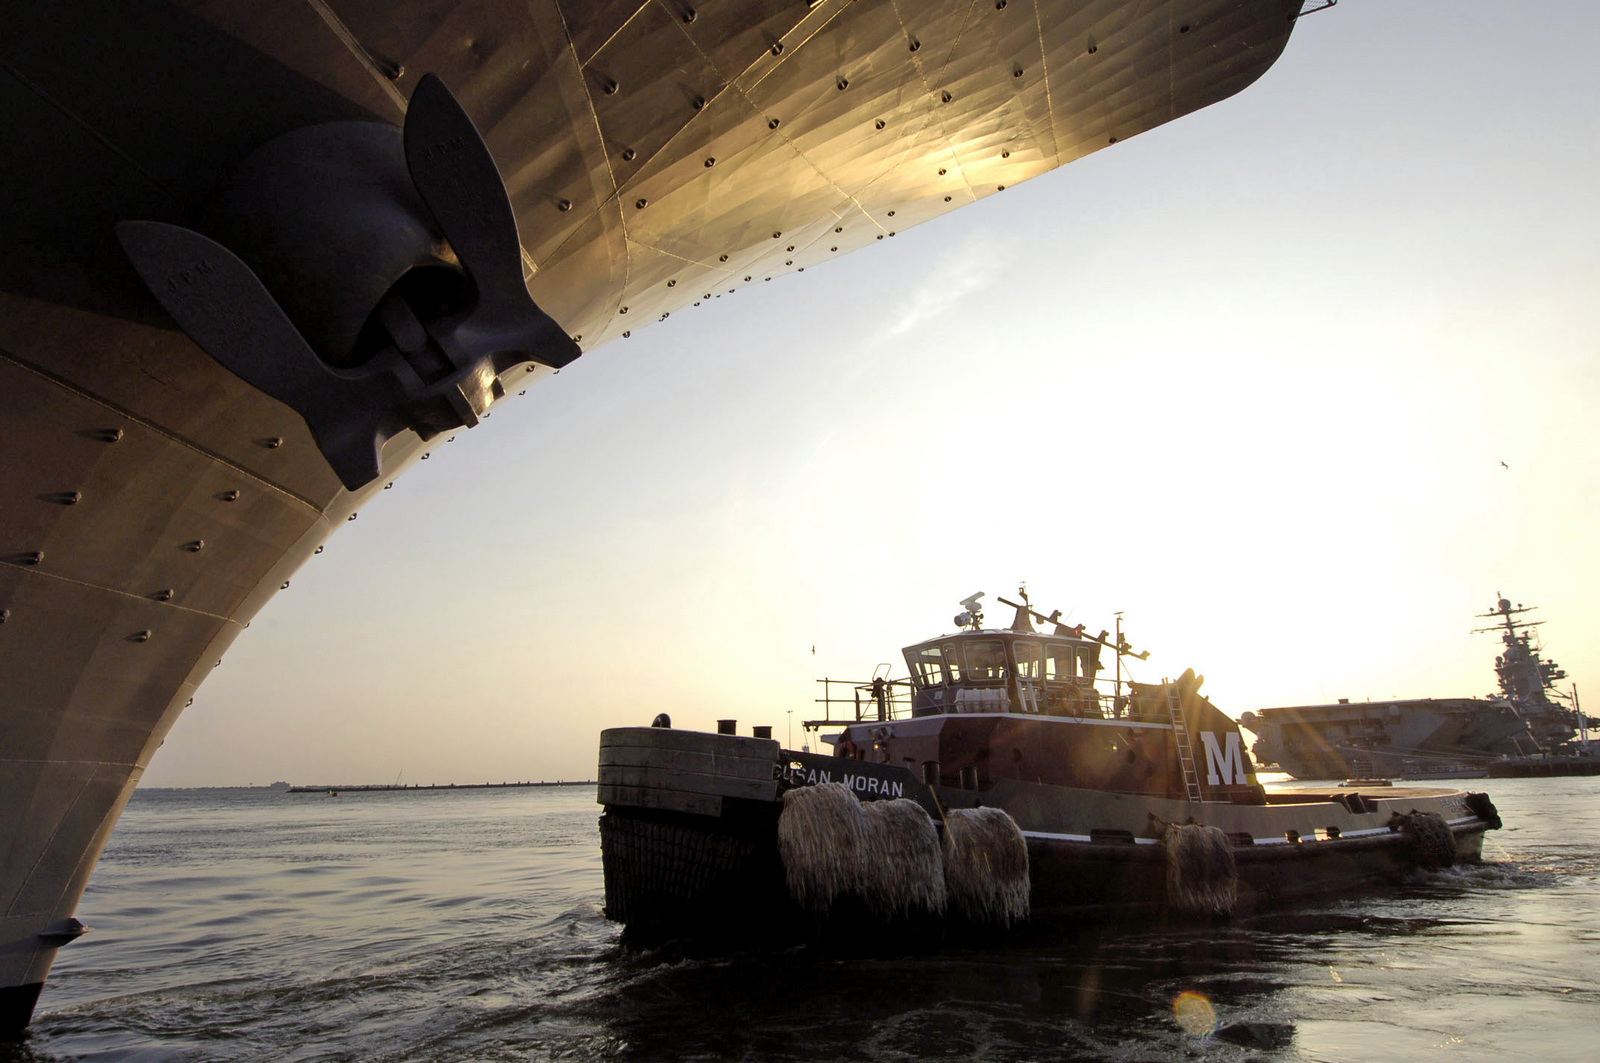 060815-N-5555T-002 (Aug  15, 2006)Tractor tug SUSAN MORAN